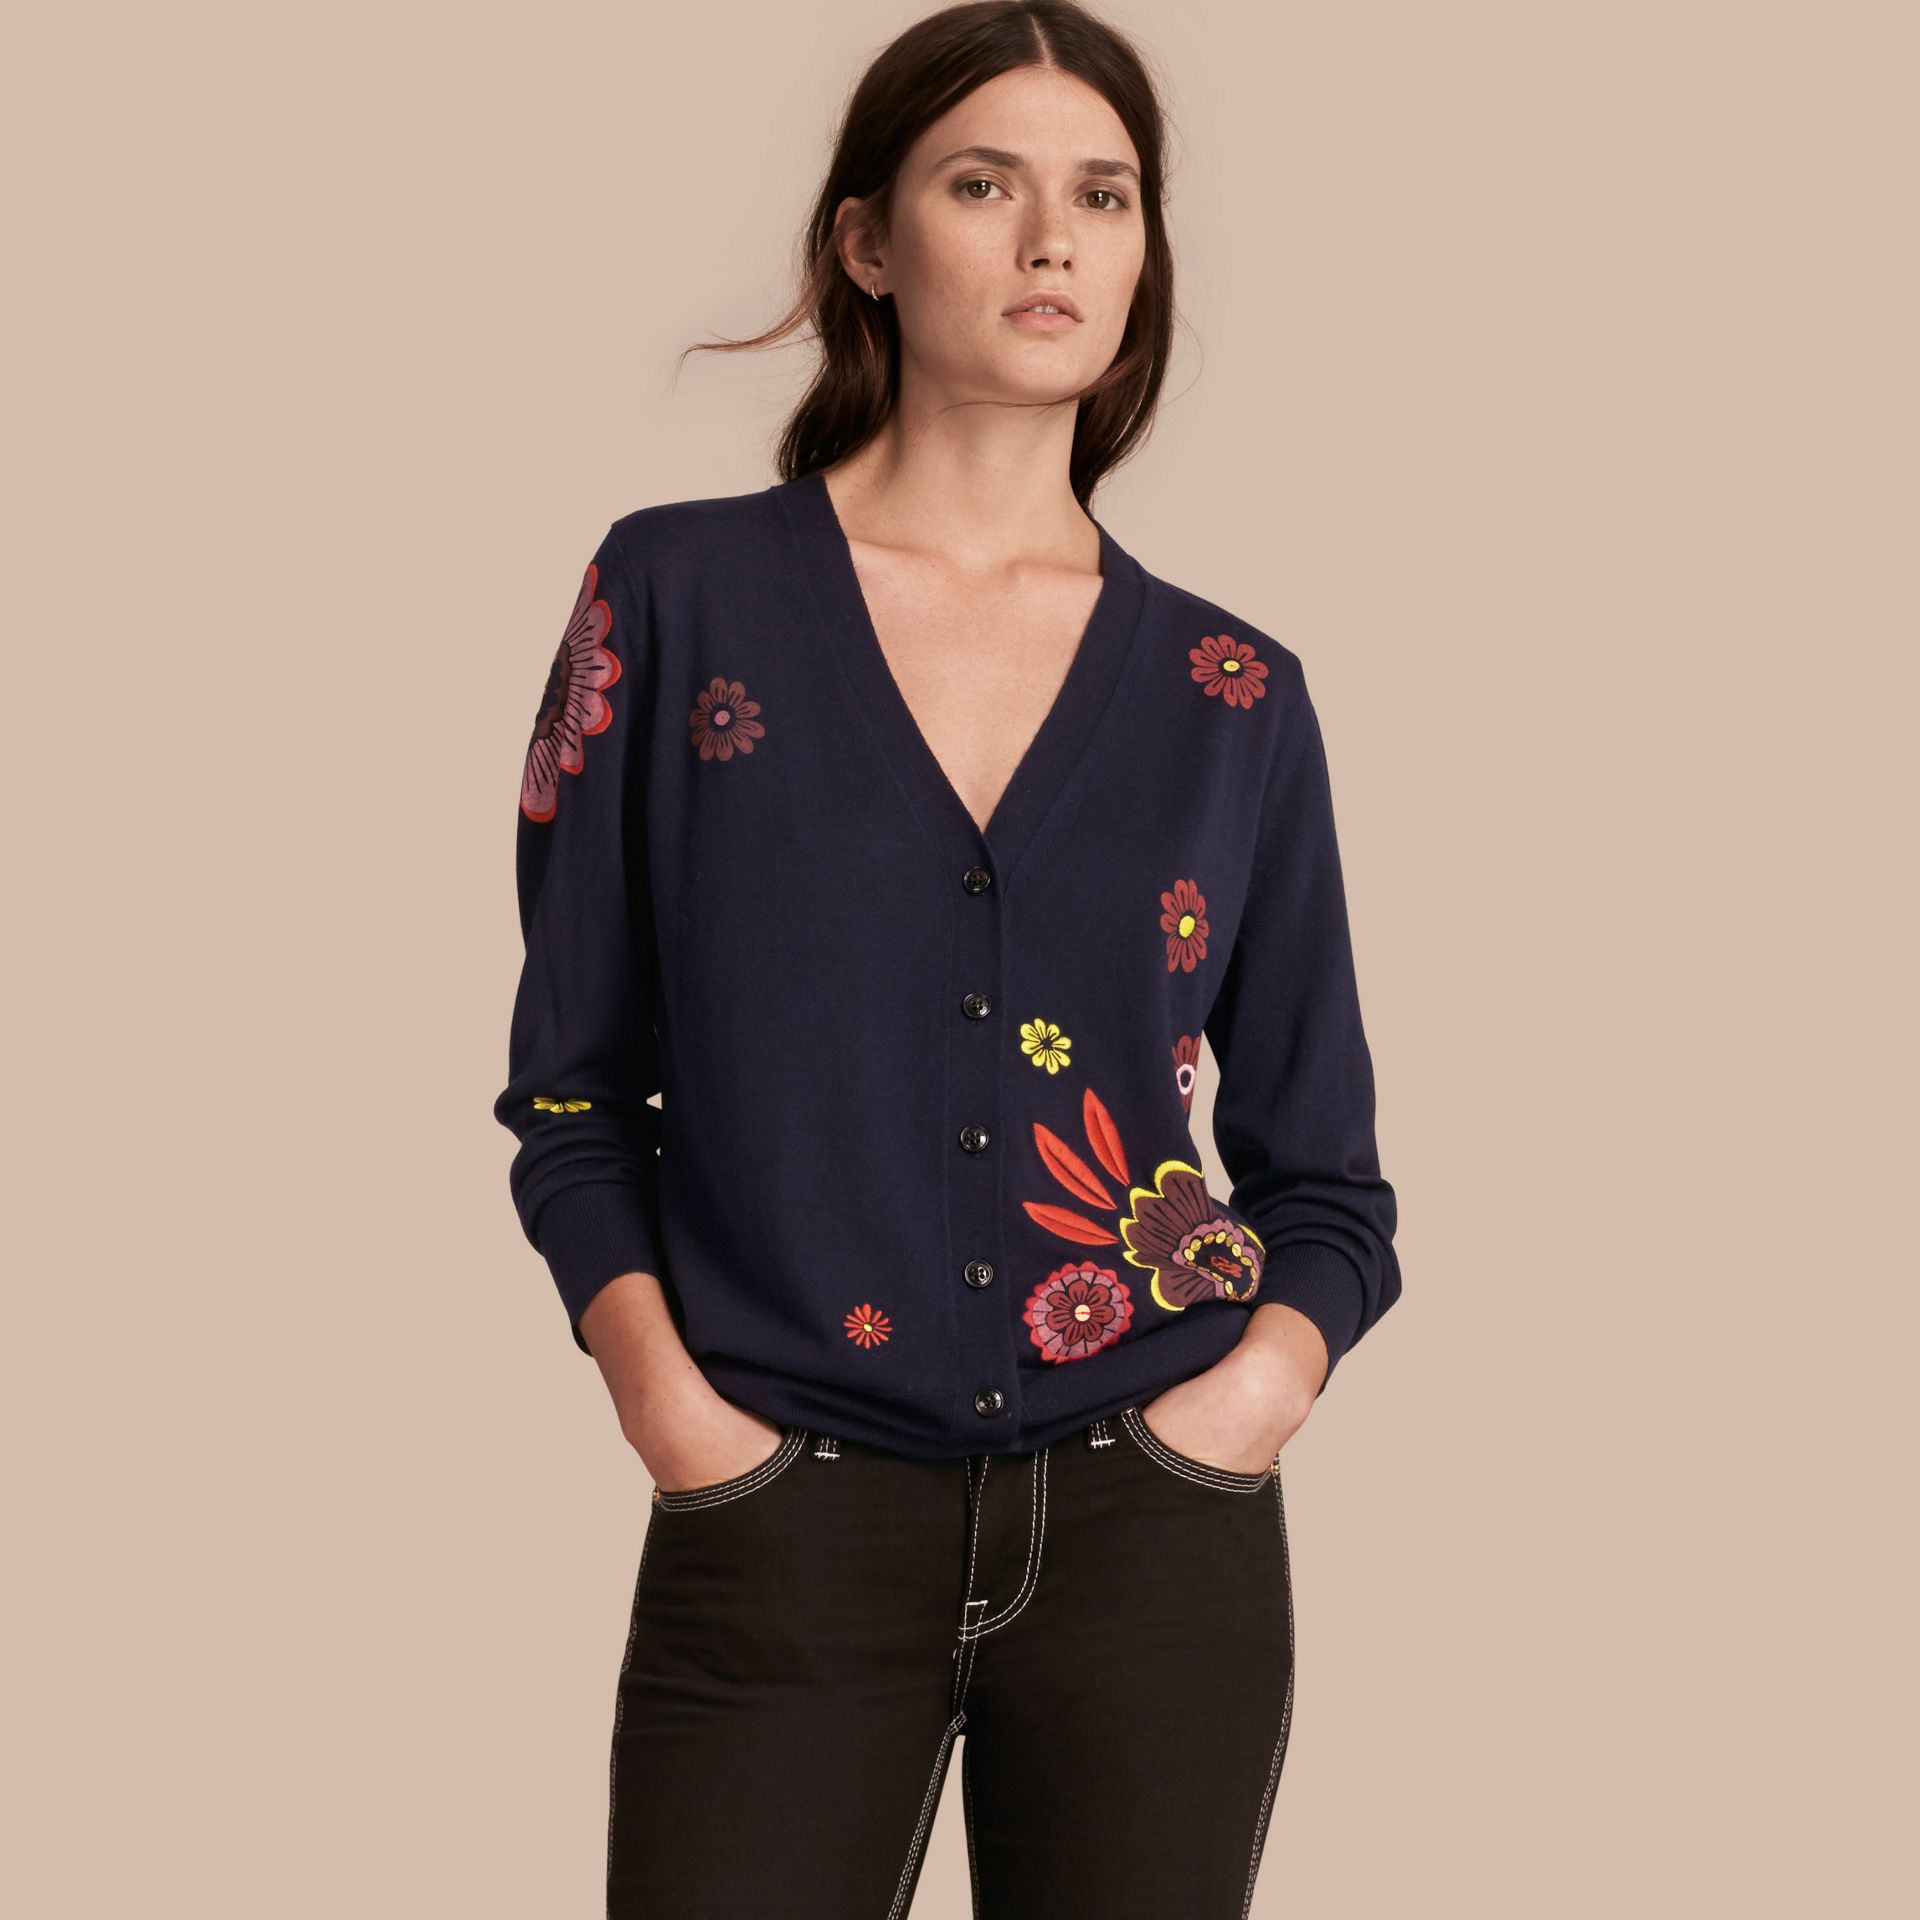 Navy Floral-embellished Merino Wool Cardigan - gallery image 1